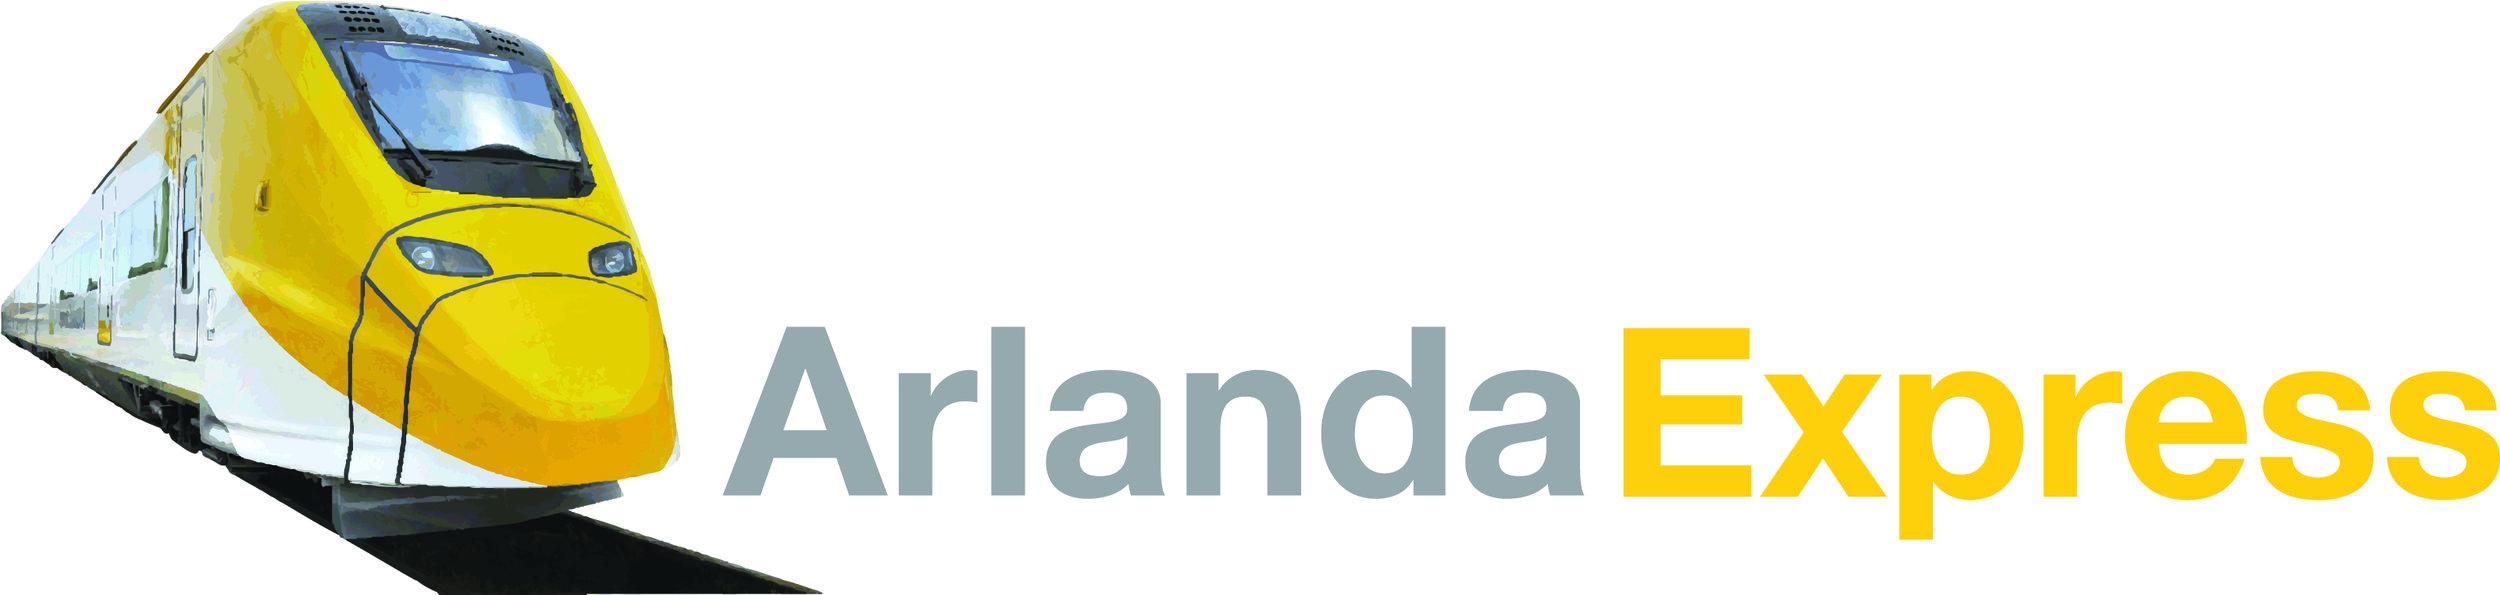 ArlandaExpress-Subvenio.jpg